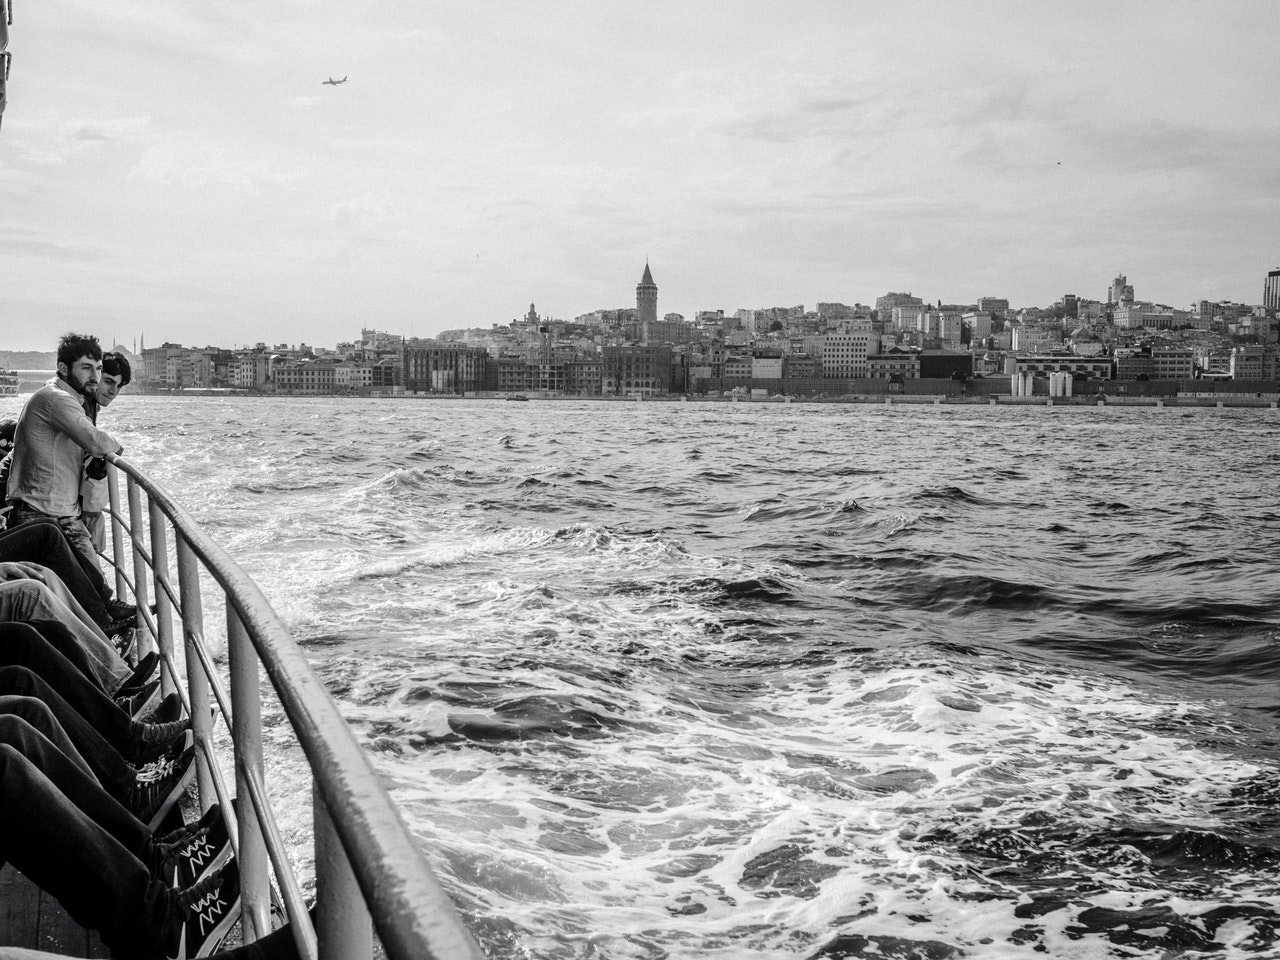 Men-On-Boat-small